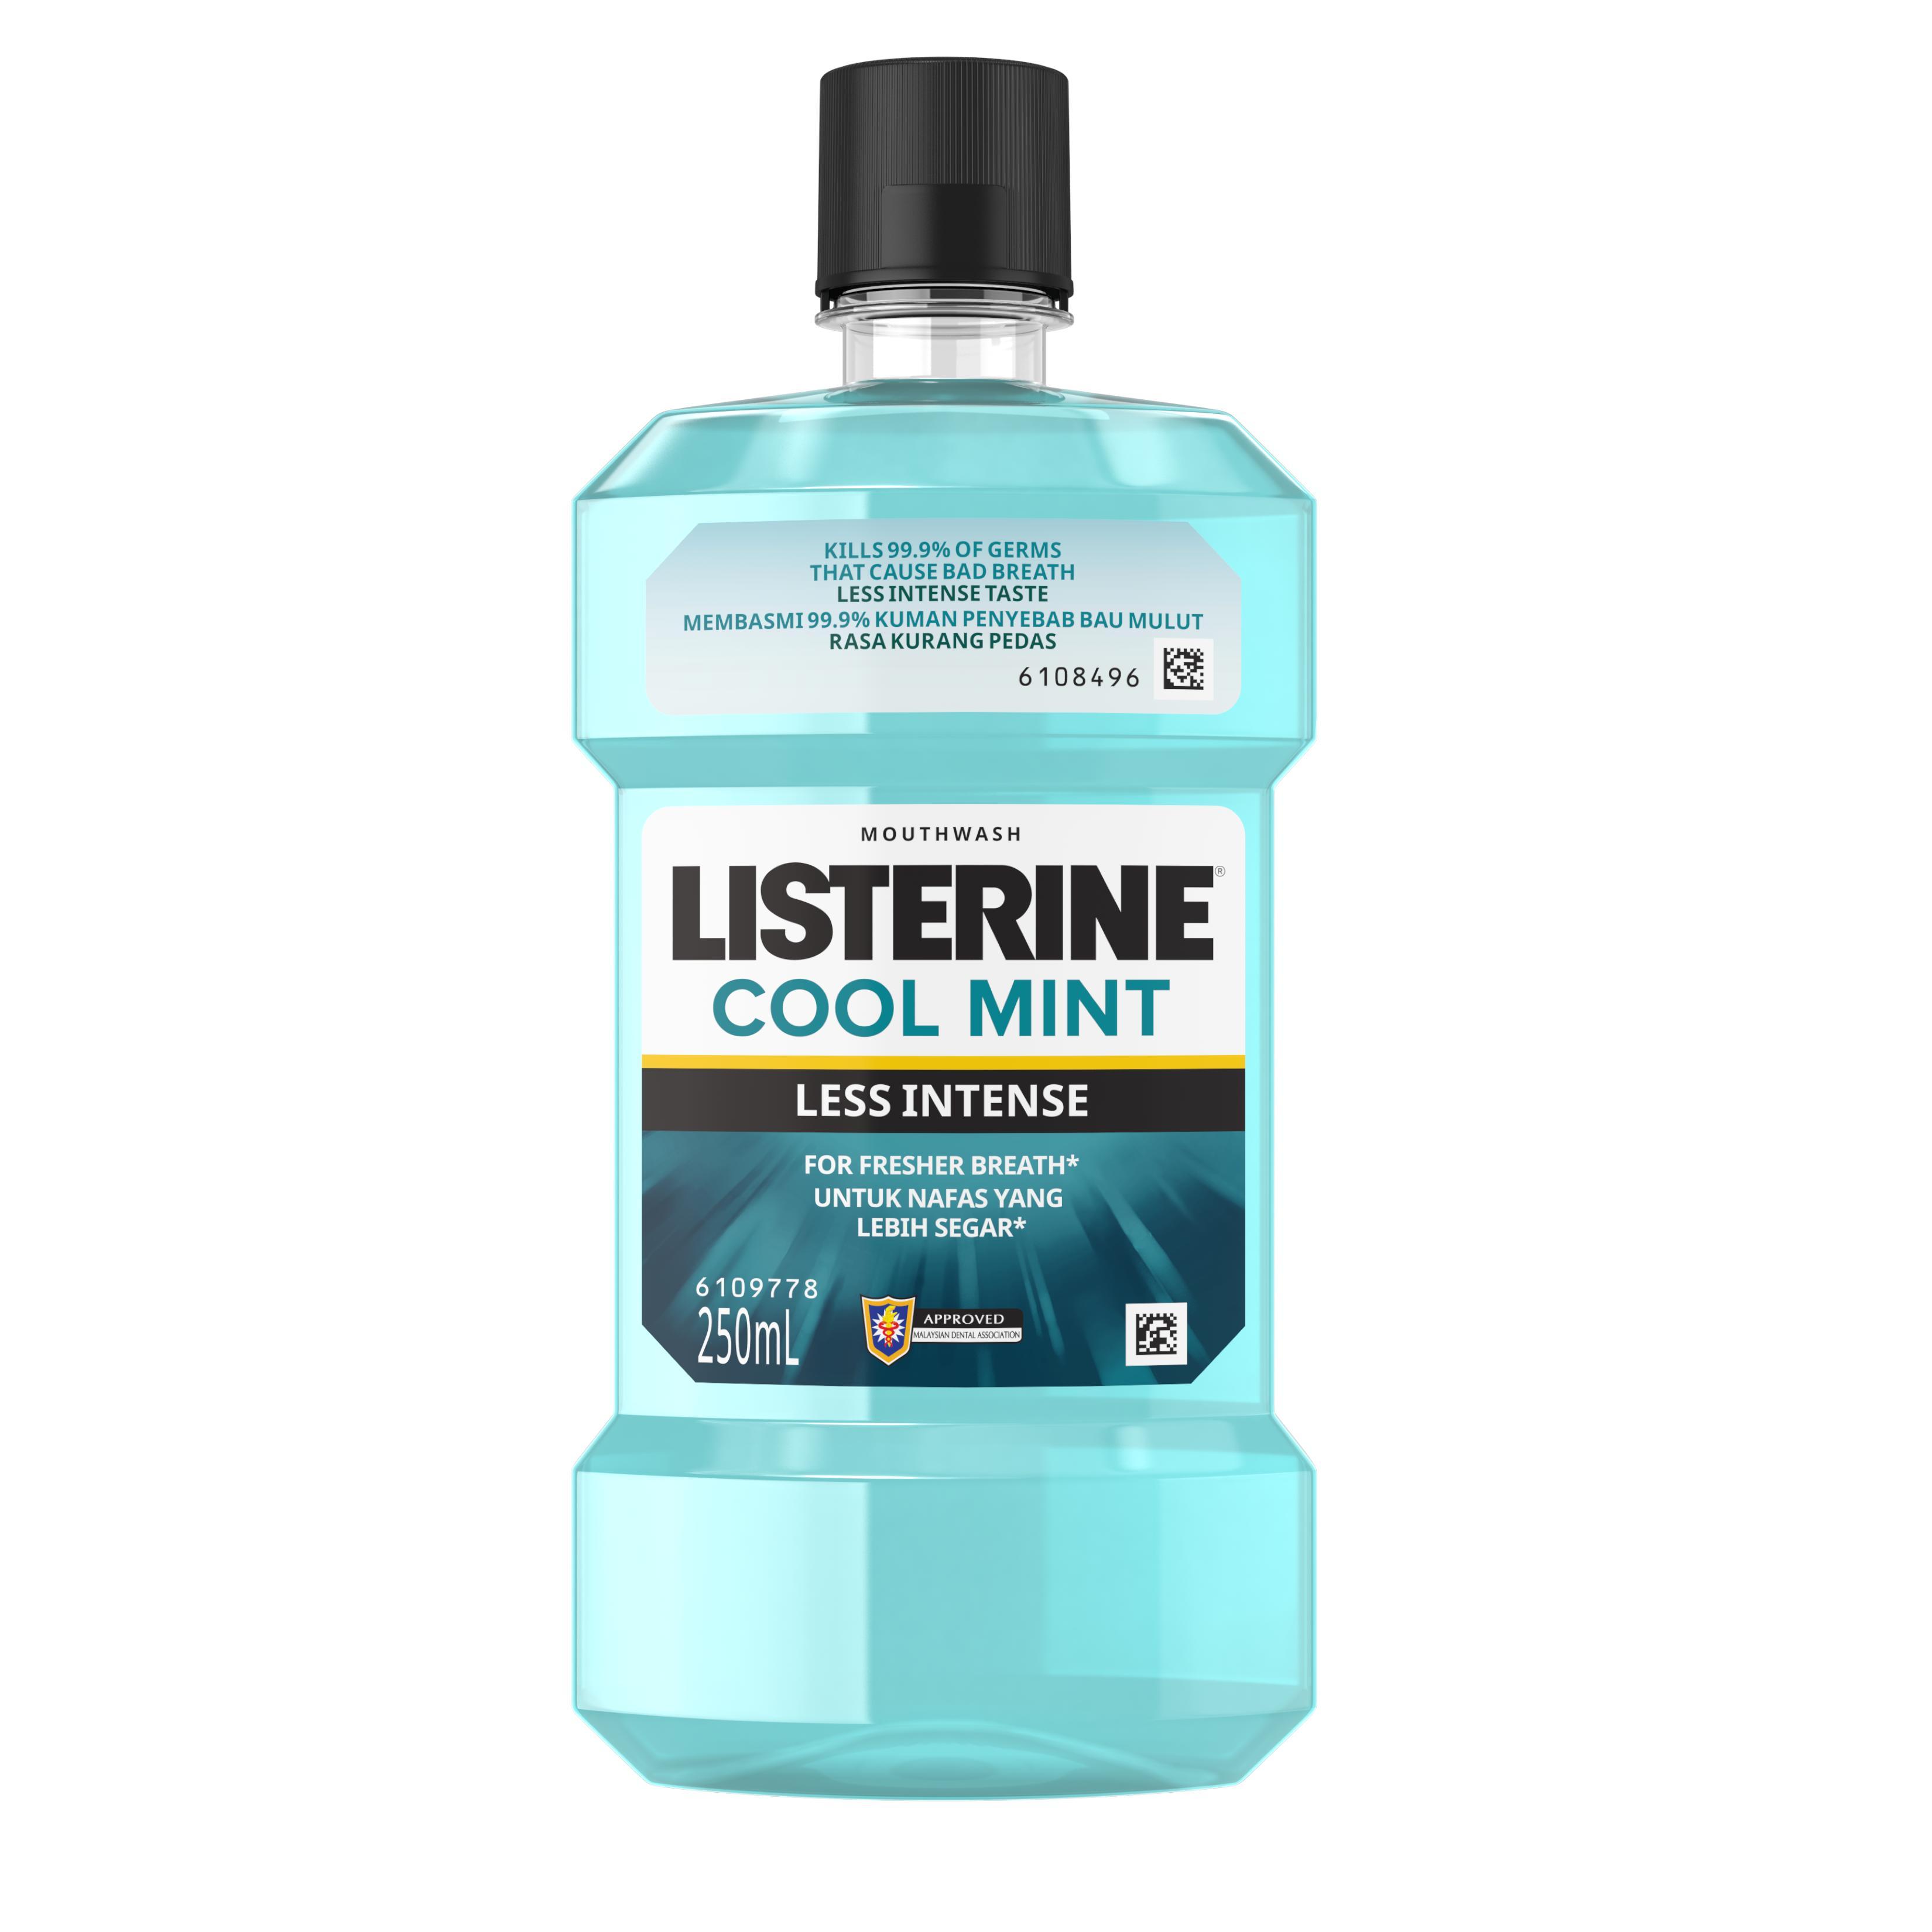 Listerine Cool Mint Less Intense Mouthwash (250ml)